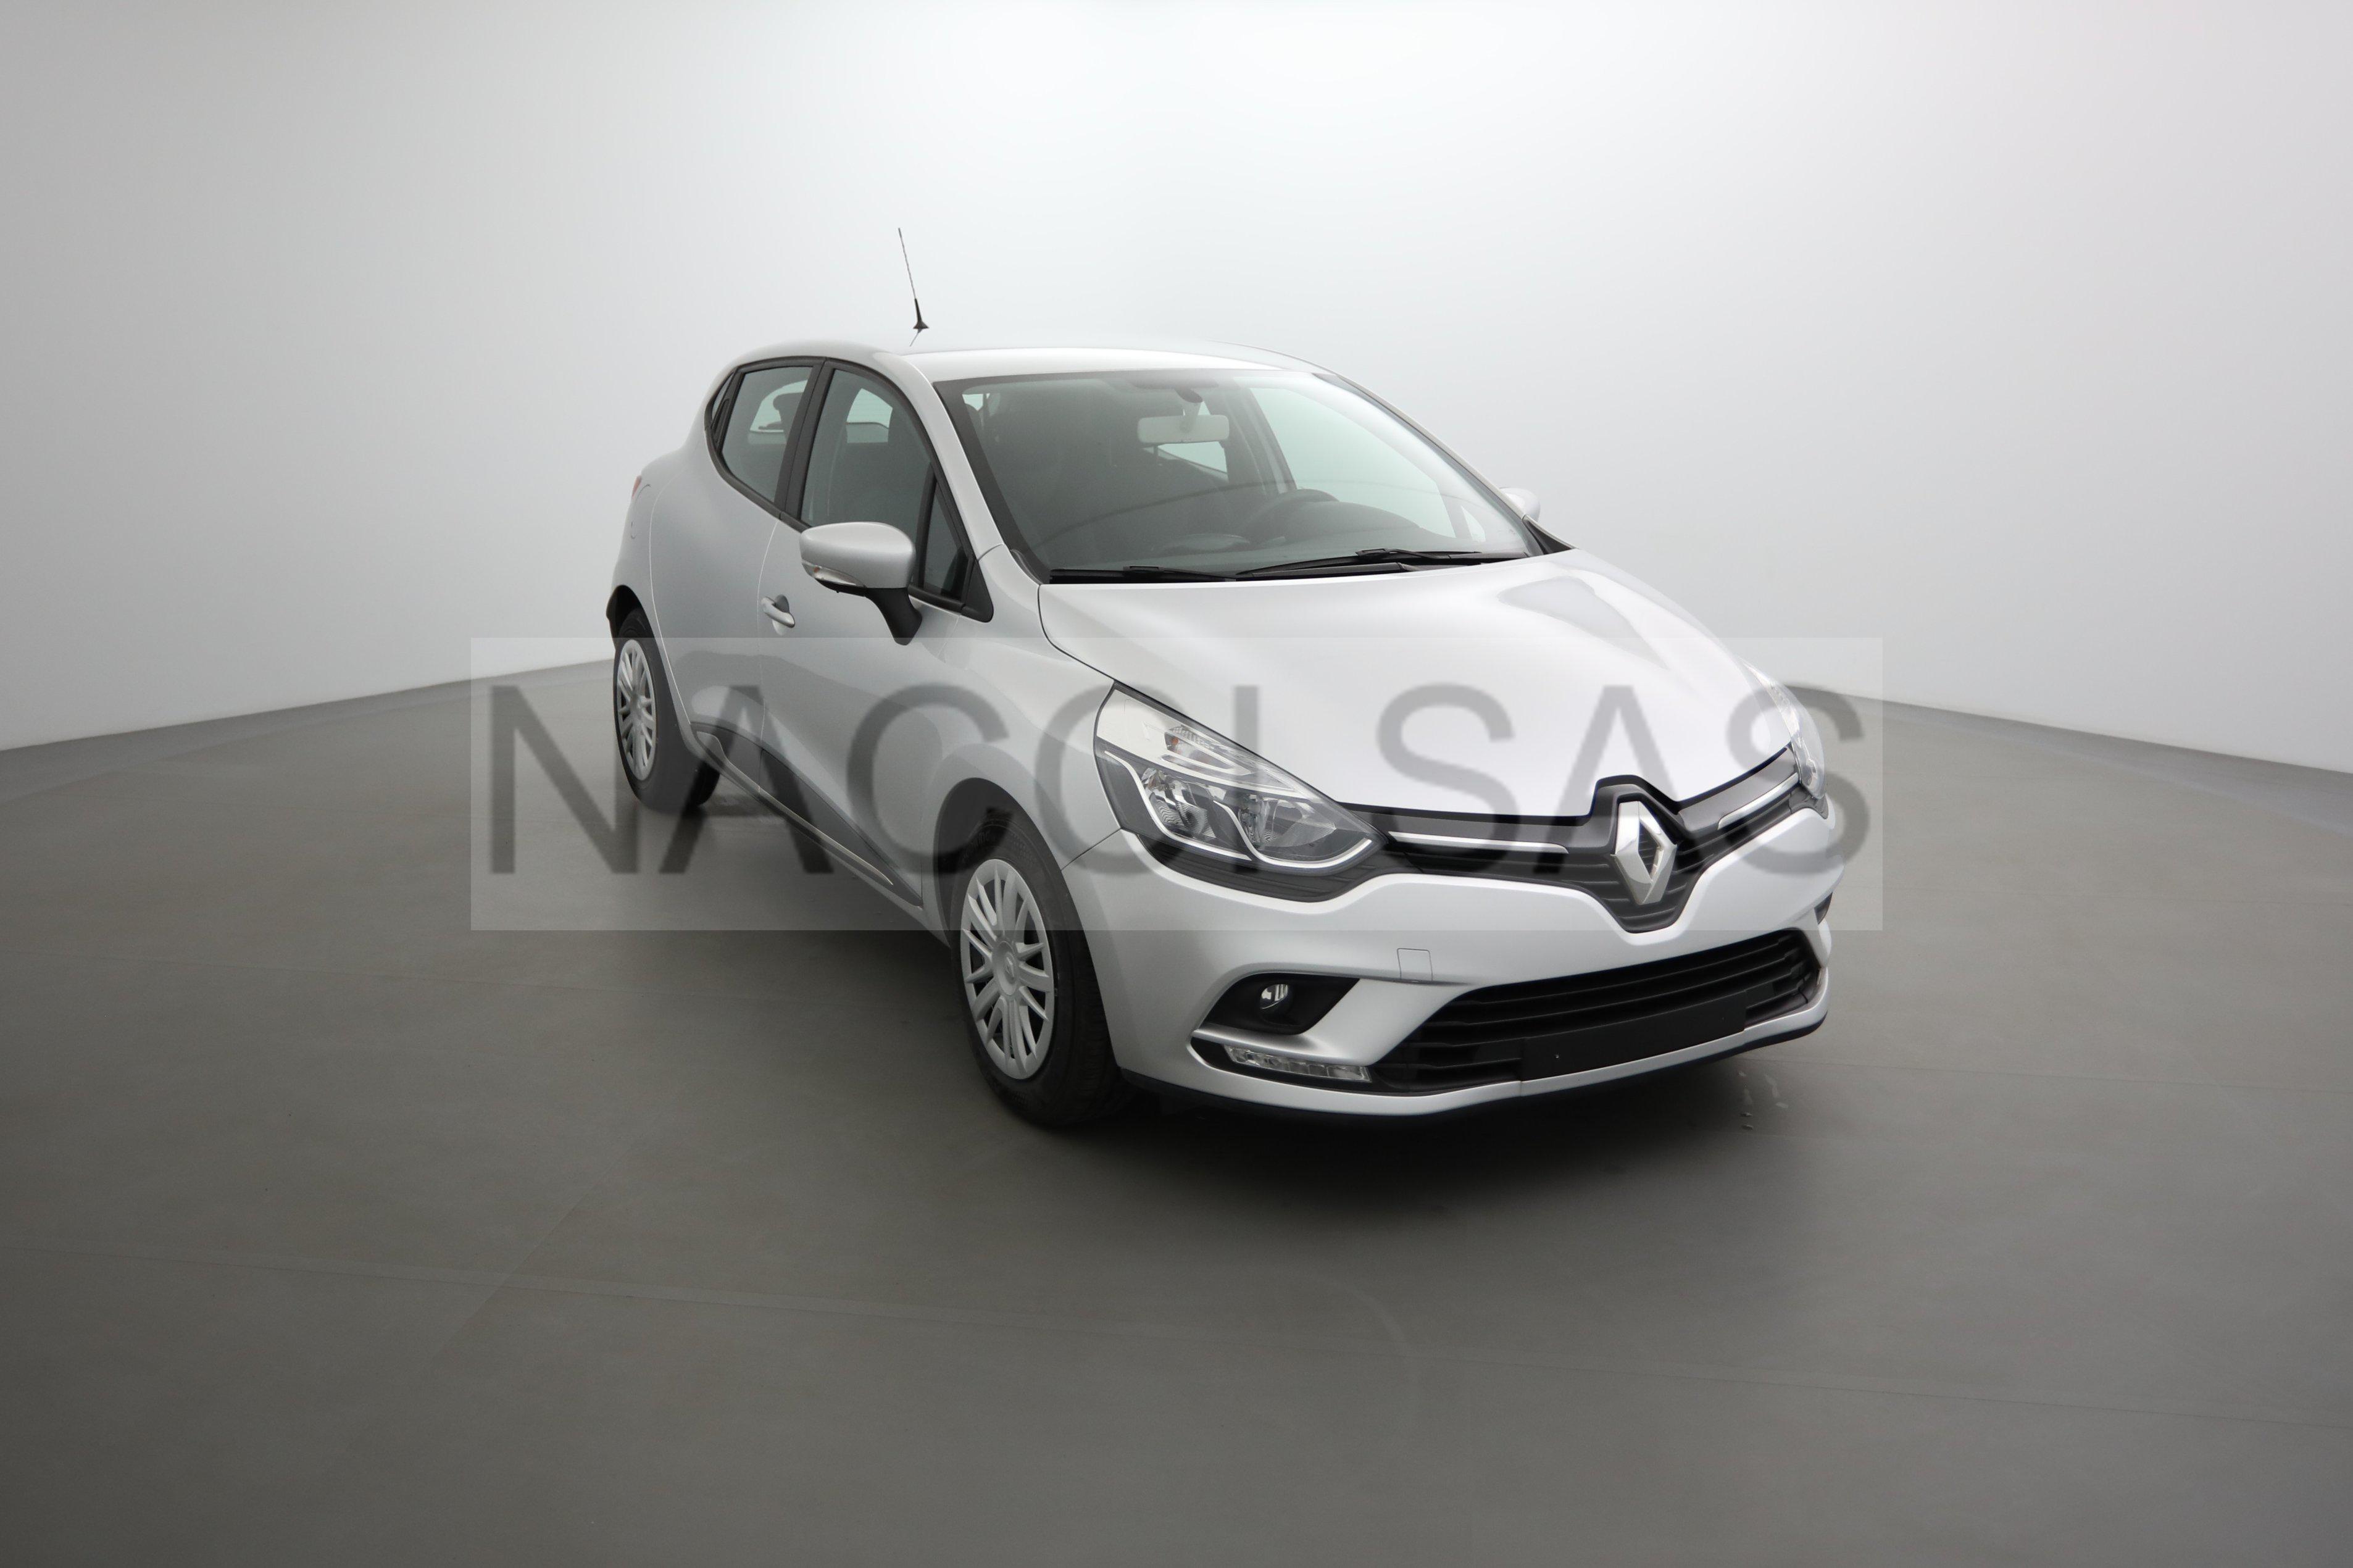 Renault Clio Iv Le Chambon Feugerolles 177544 Nacci Sas